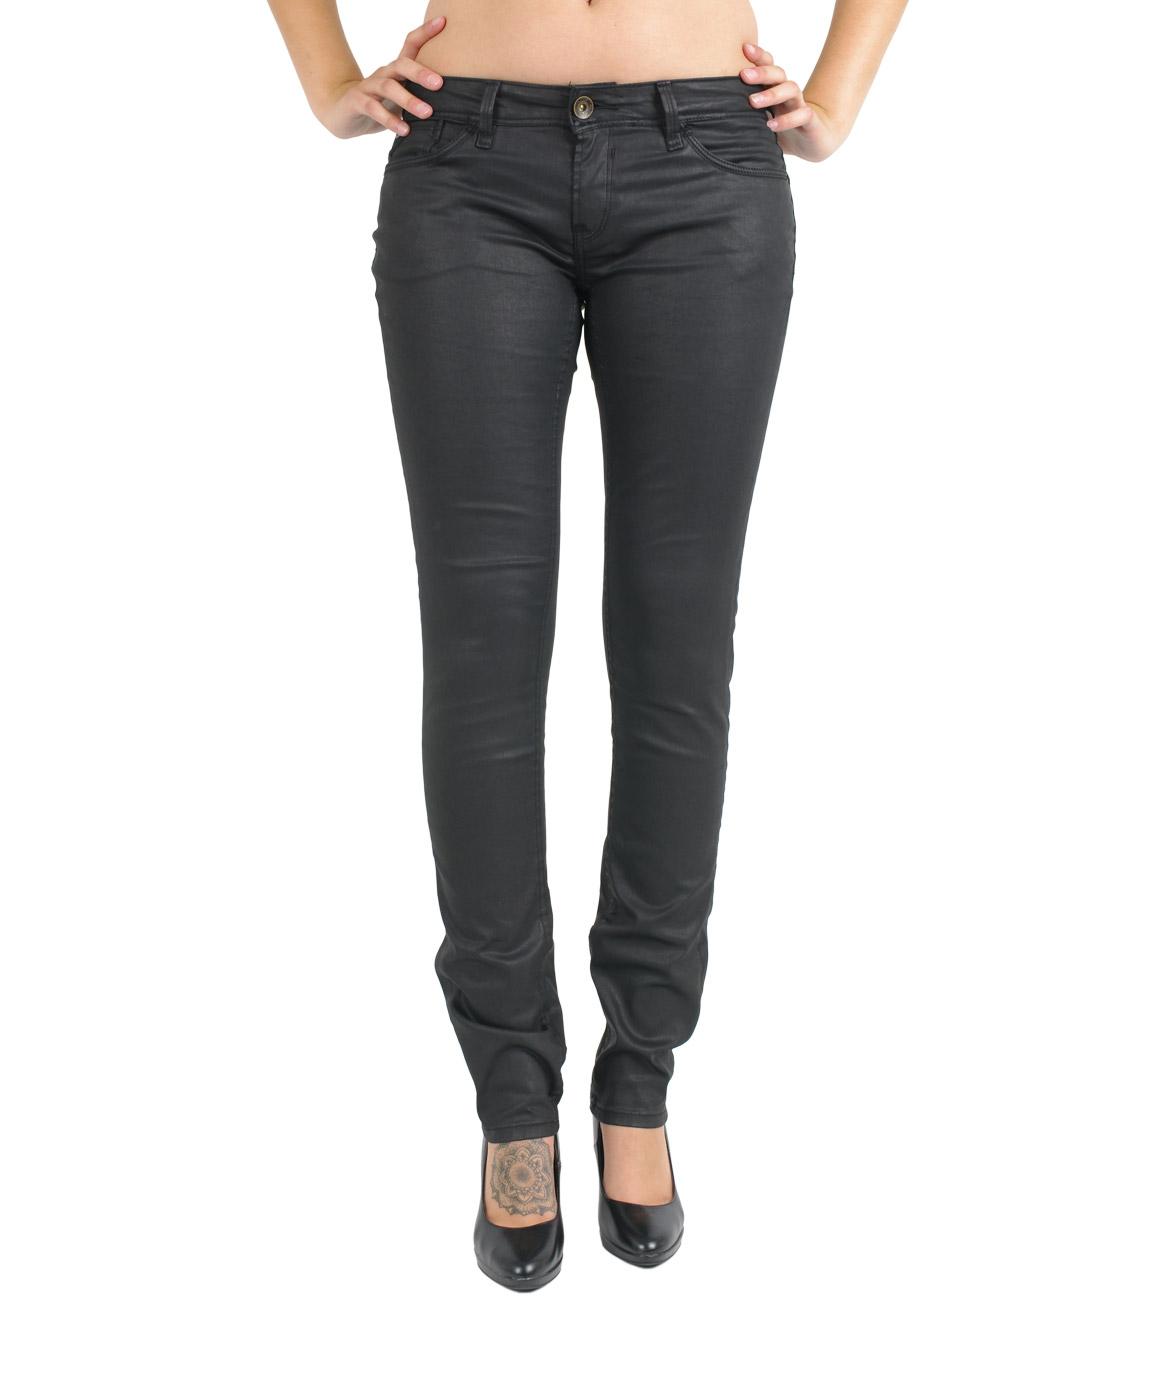 Hosen - Garcia Slim Fit Jeans Riva in Black Coated  - Onlineshop Jeans Meile